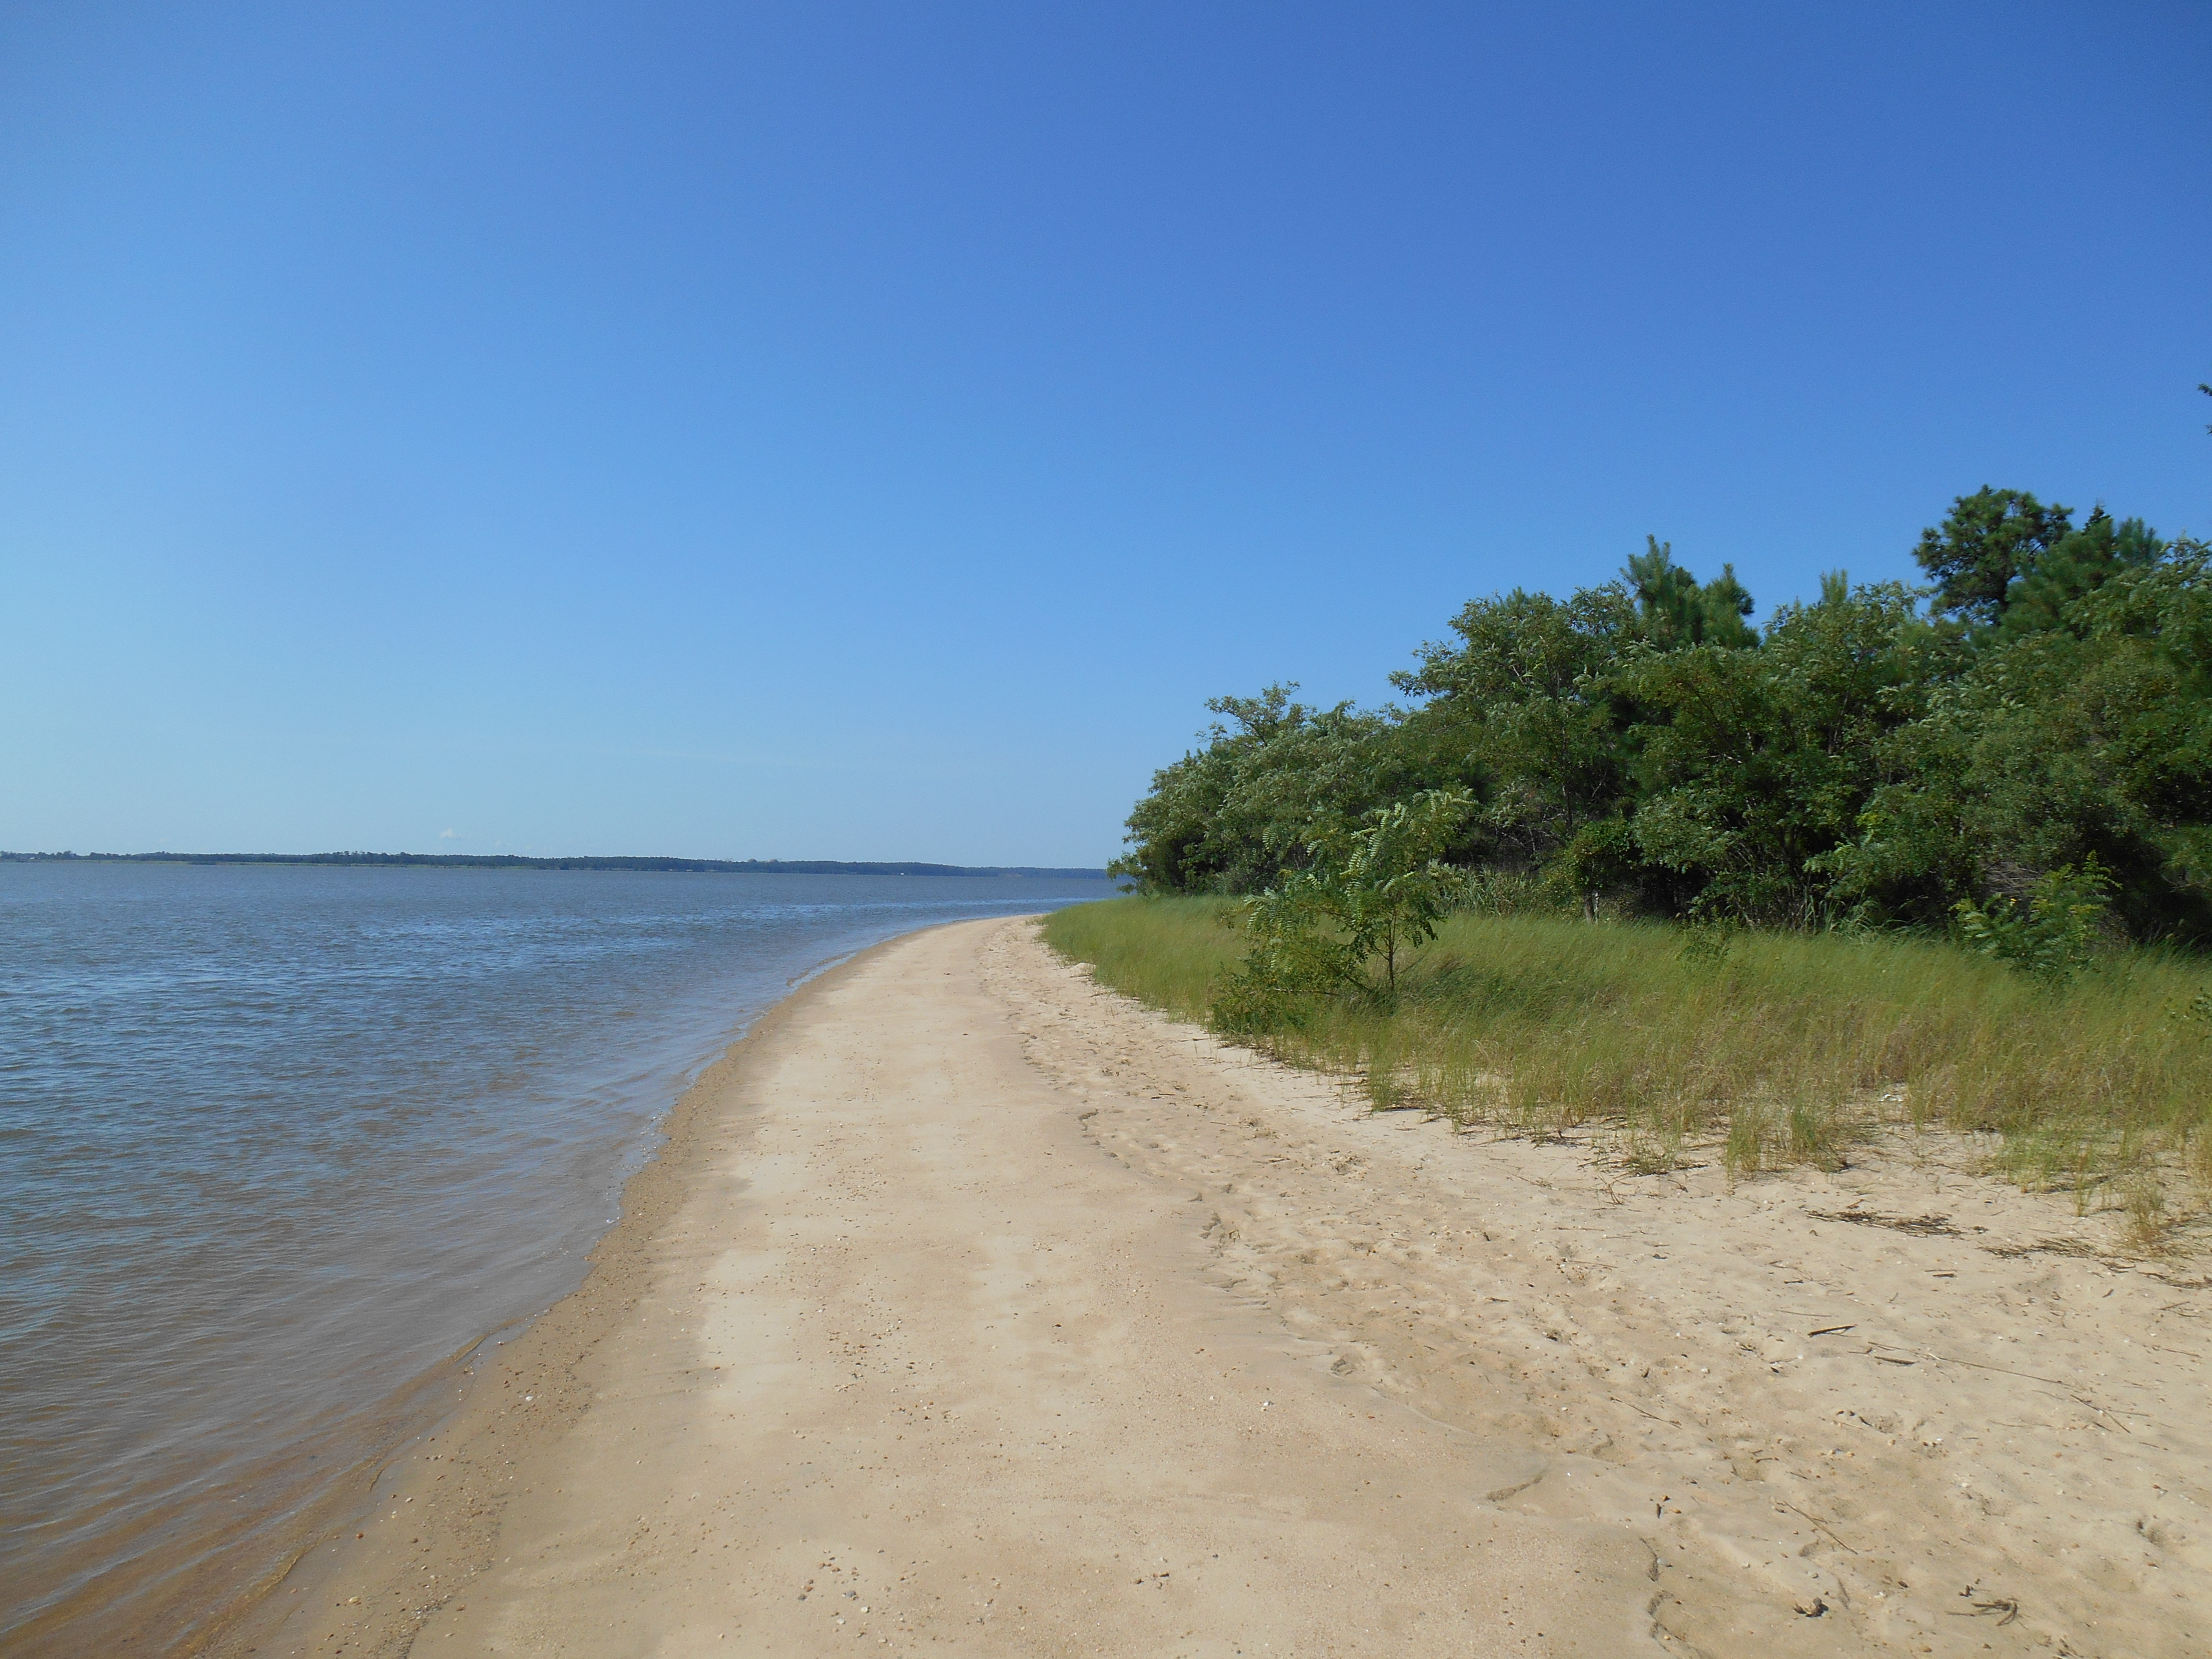 Beaches near Williamsburg — Mr Williamsburg |Williamsburg Beach